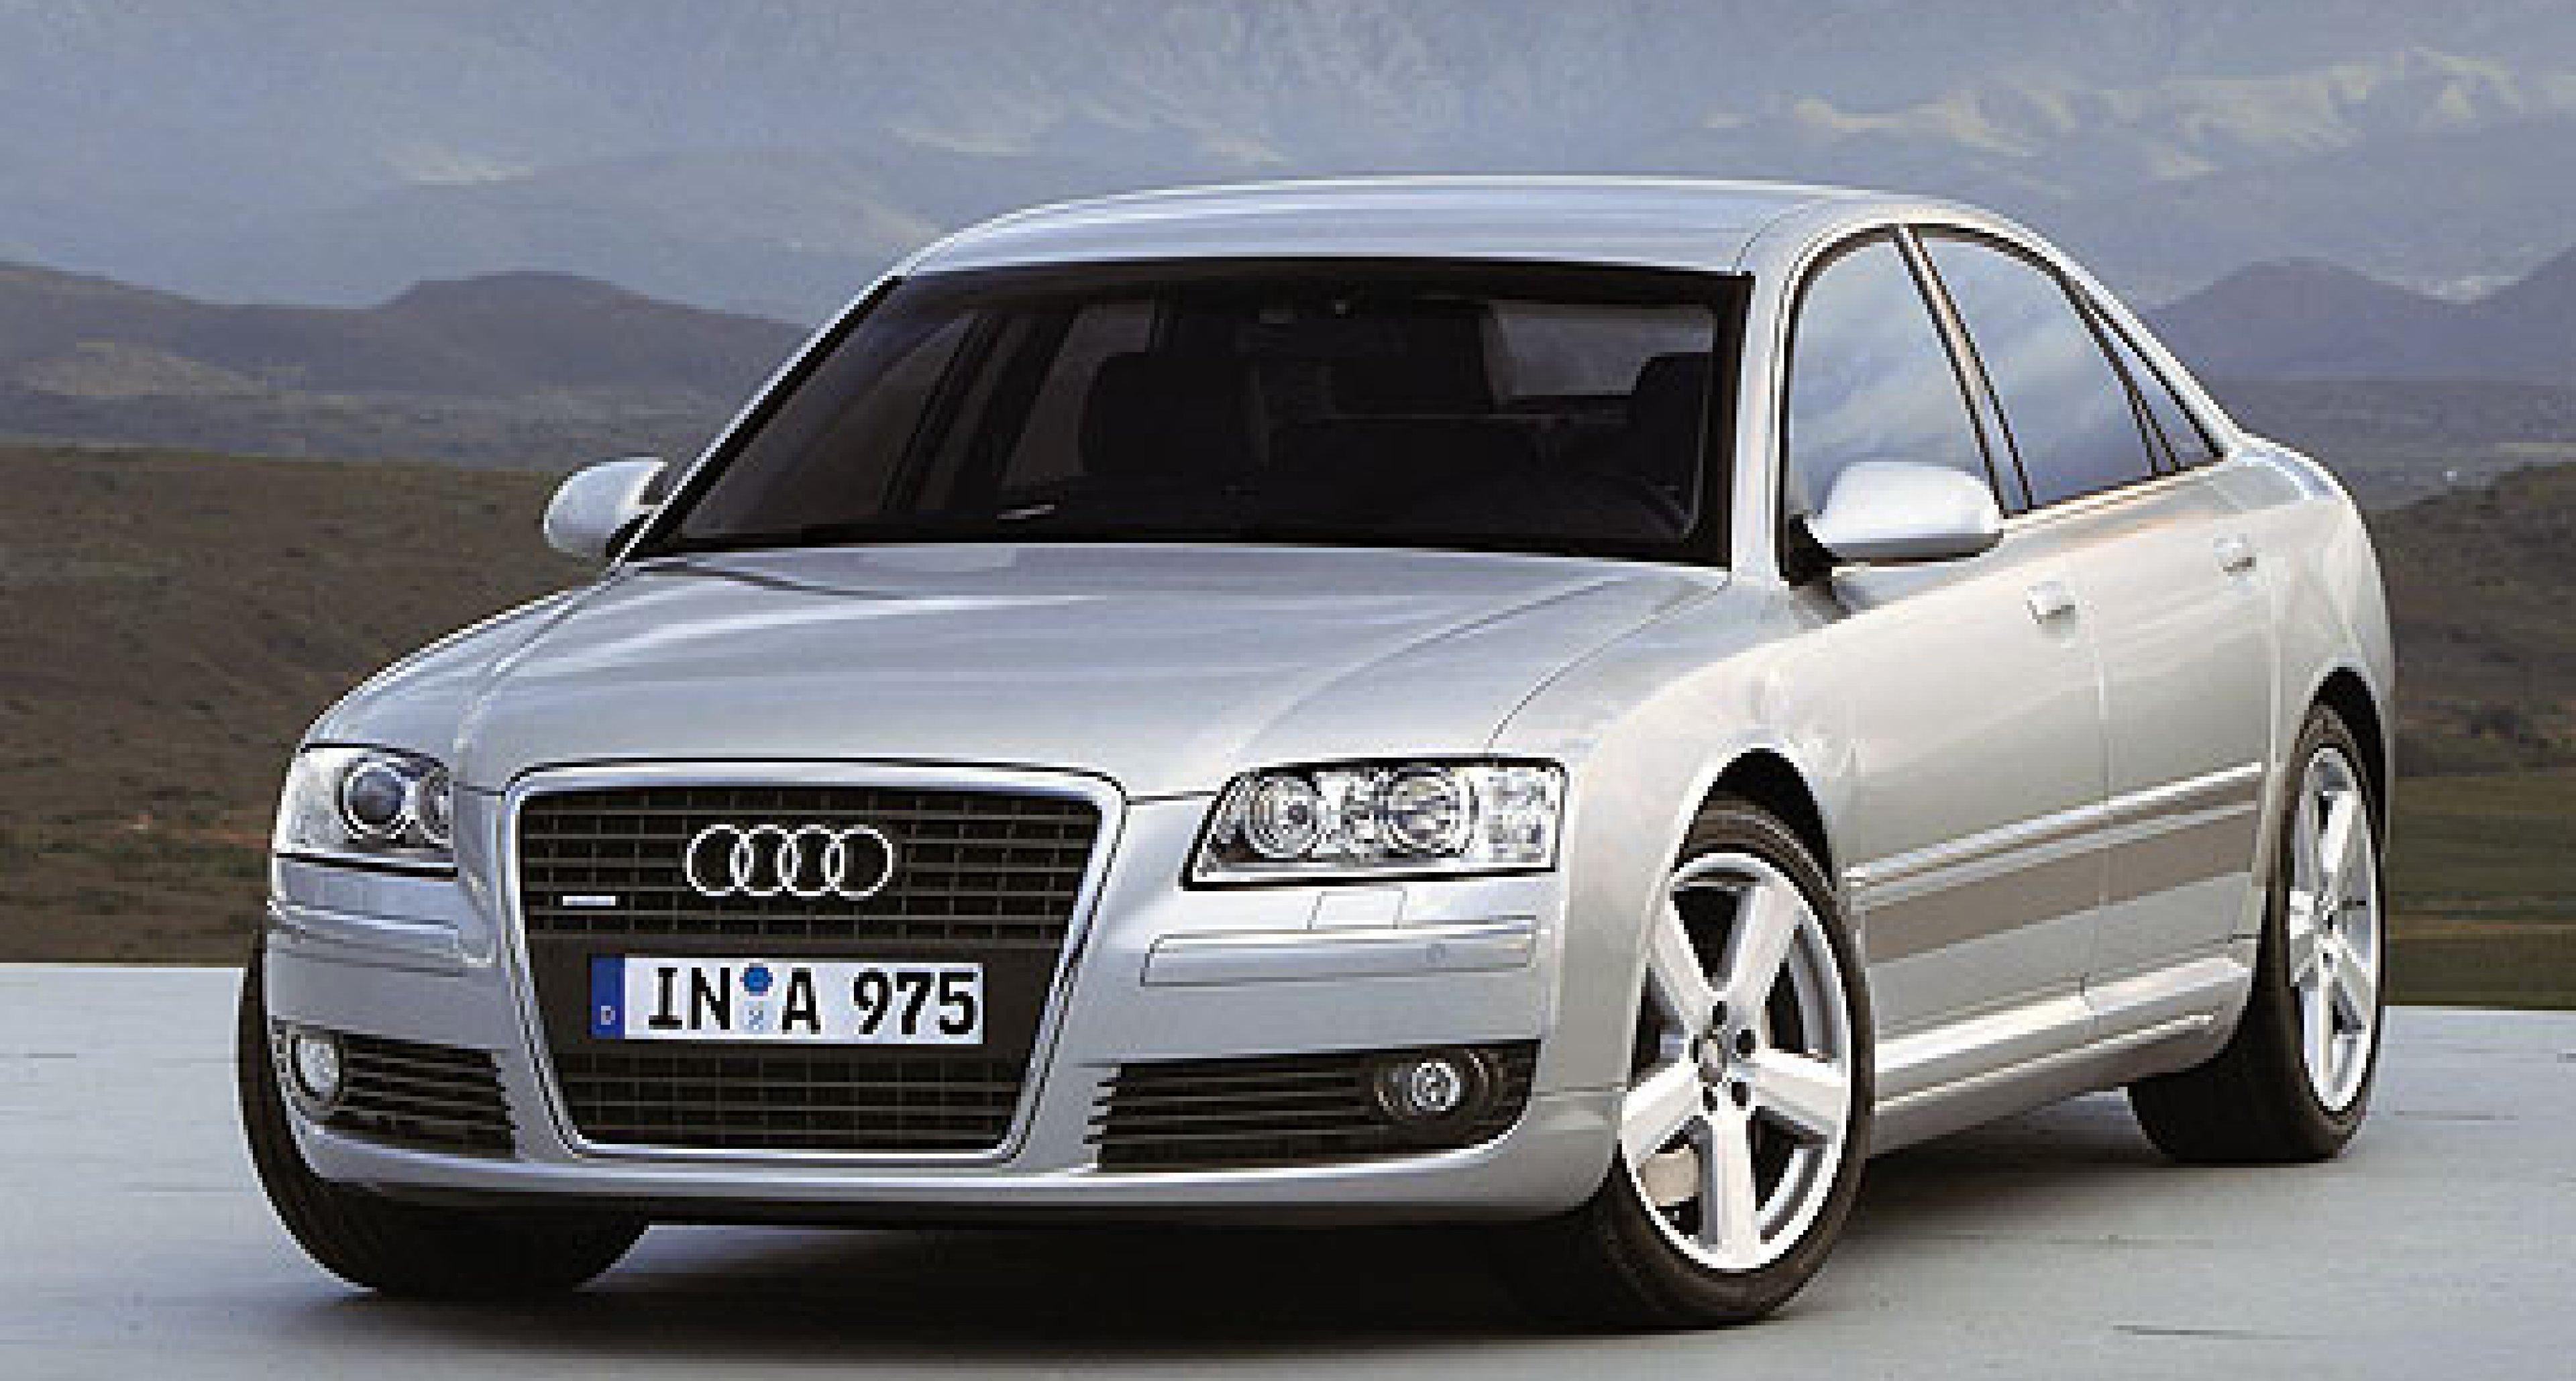 Audi A8 3.2 FSI: Kraftvoller Einstieg